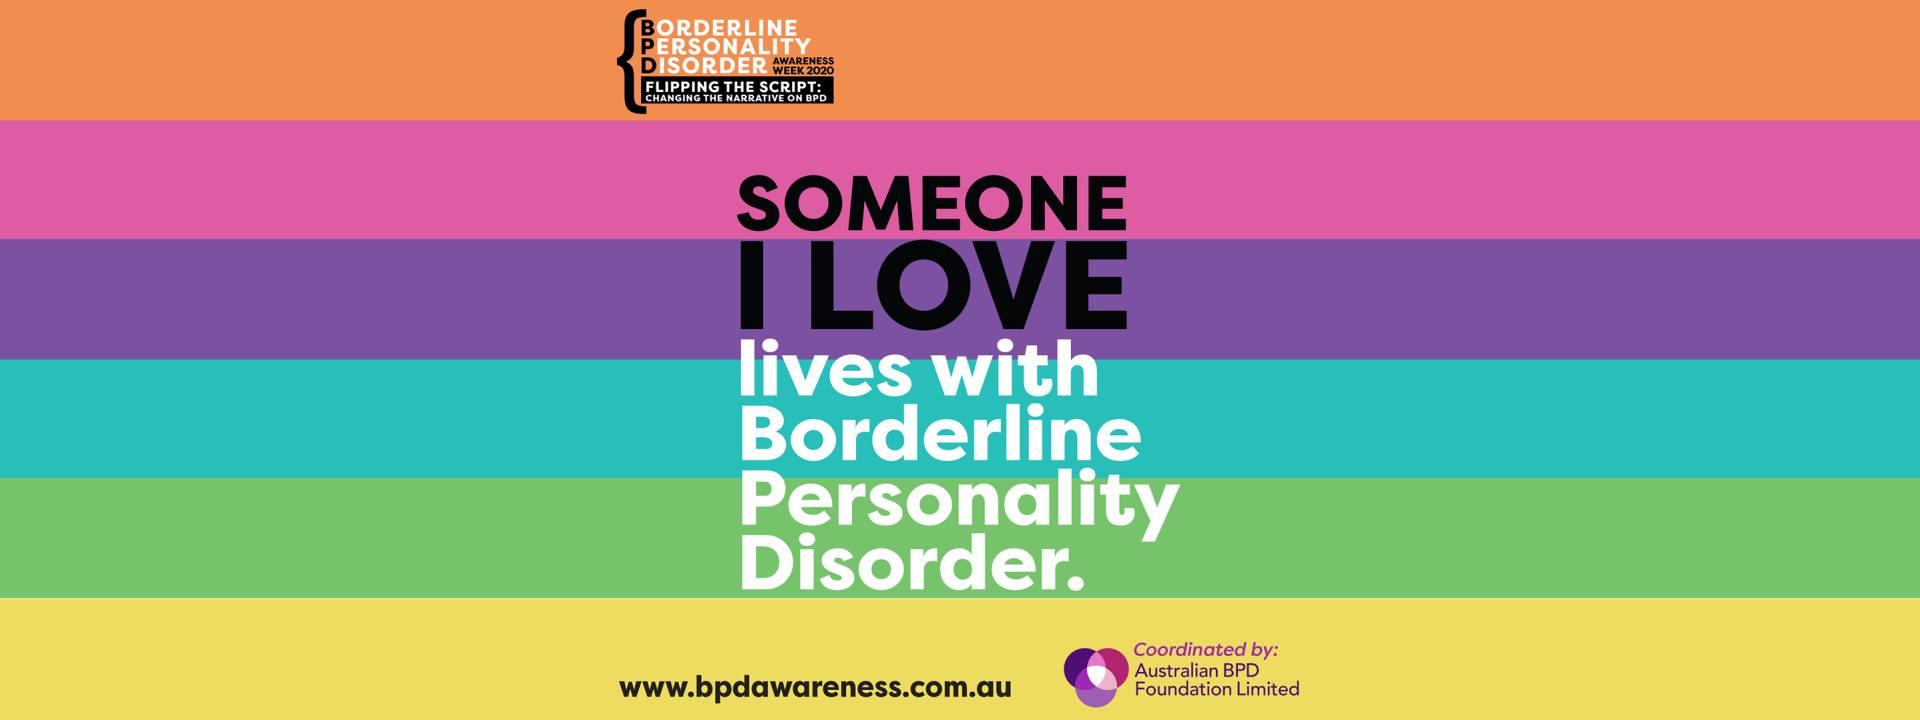 BPD Awareness Week 2020 - Someone I Love